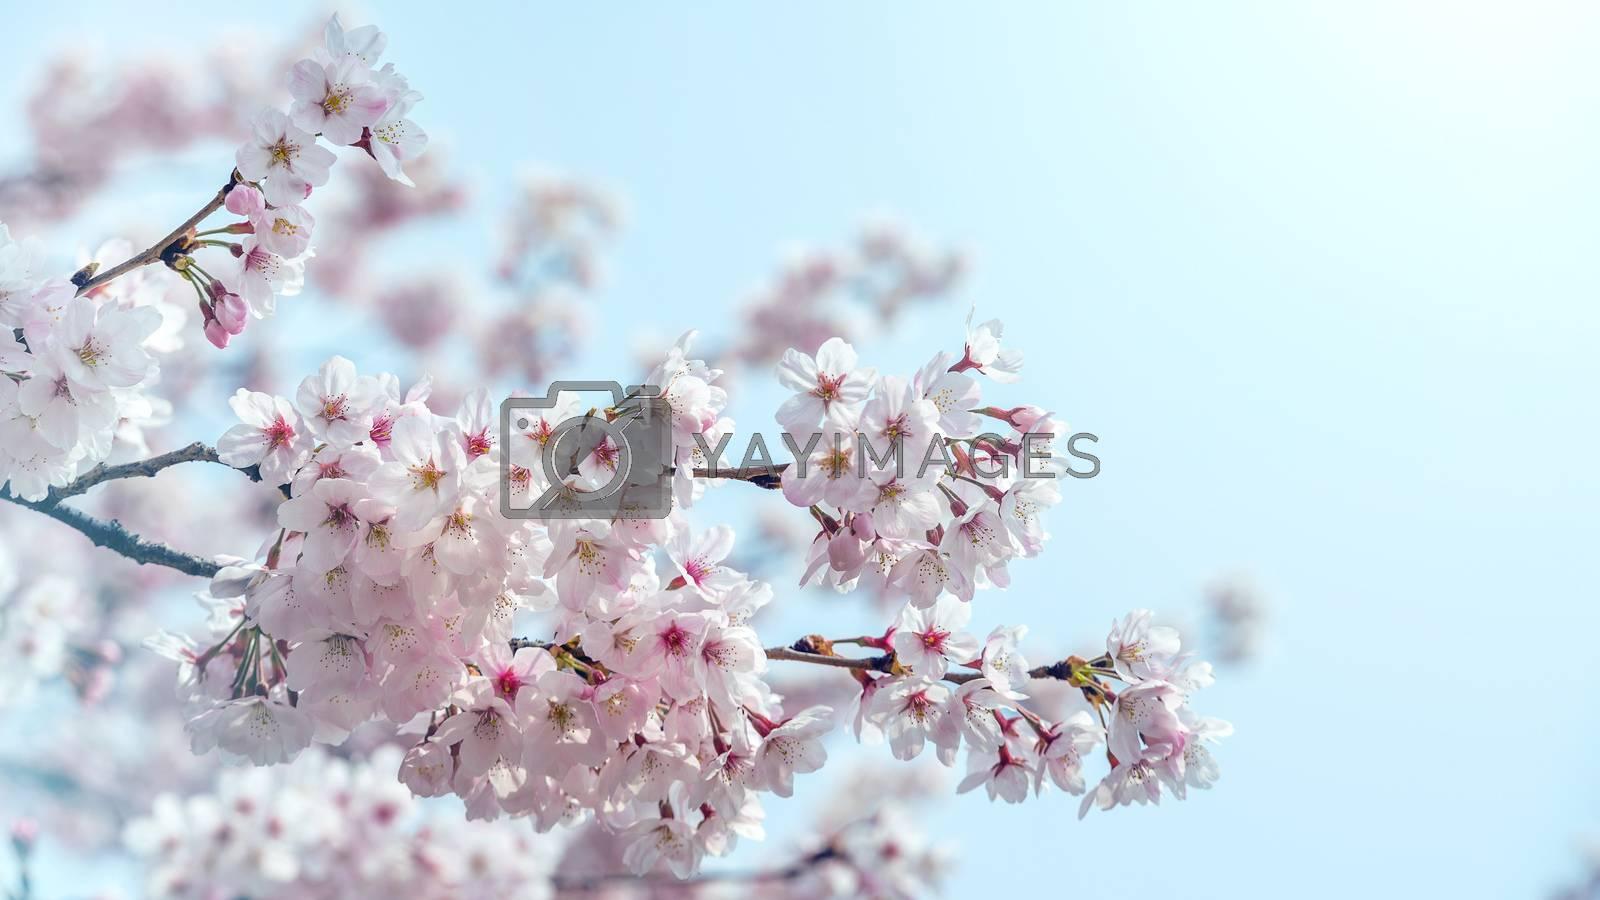 Cherry blossom in spring. spring season background, Sakura season in korea. Soft focus